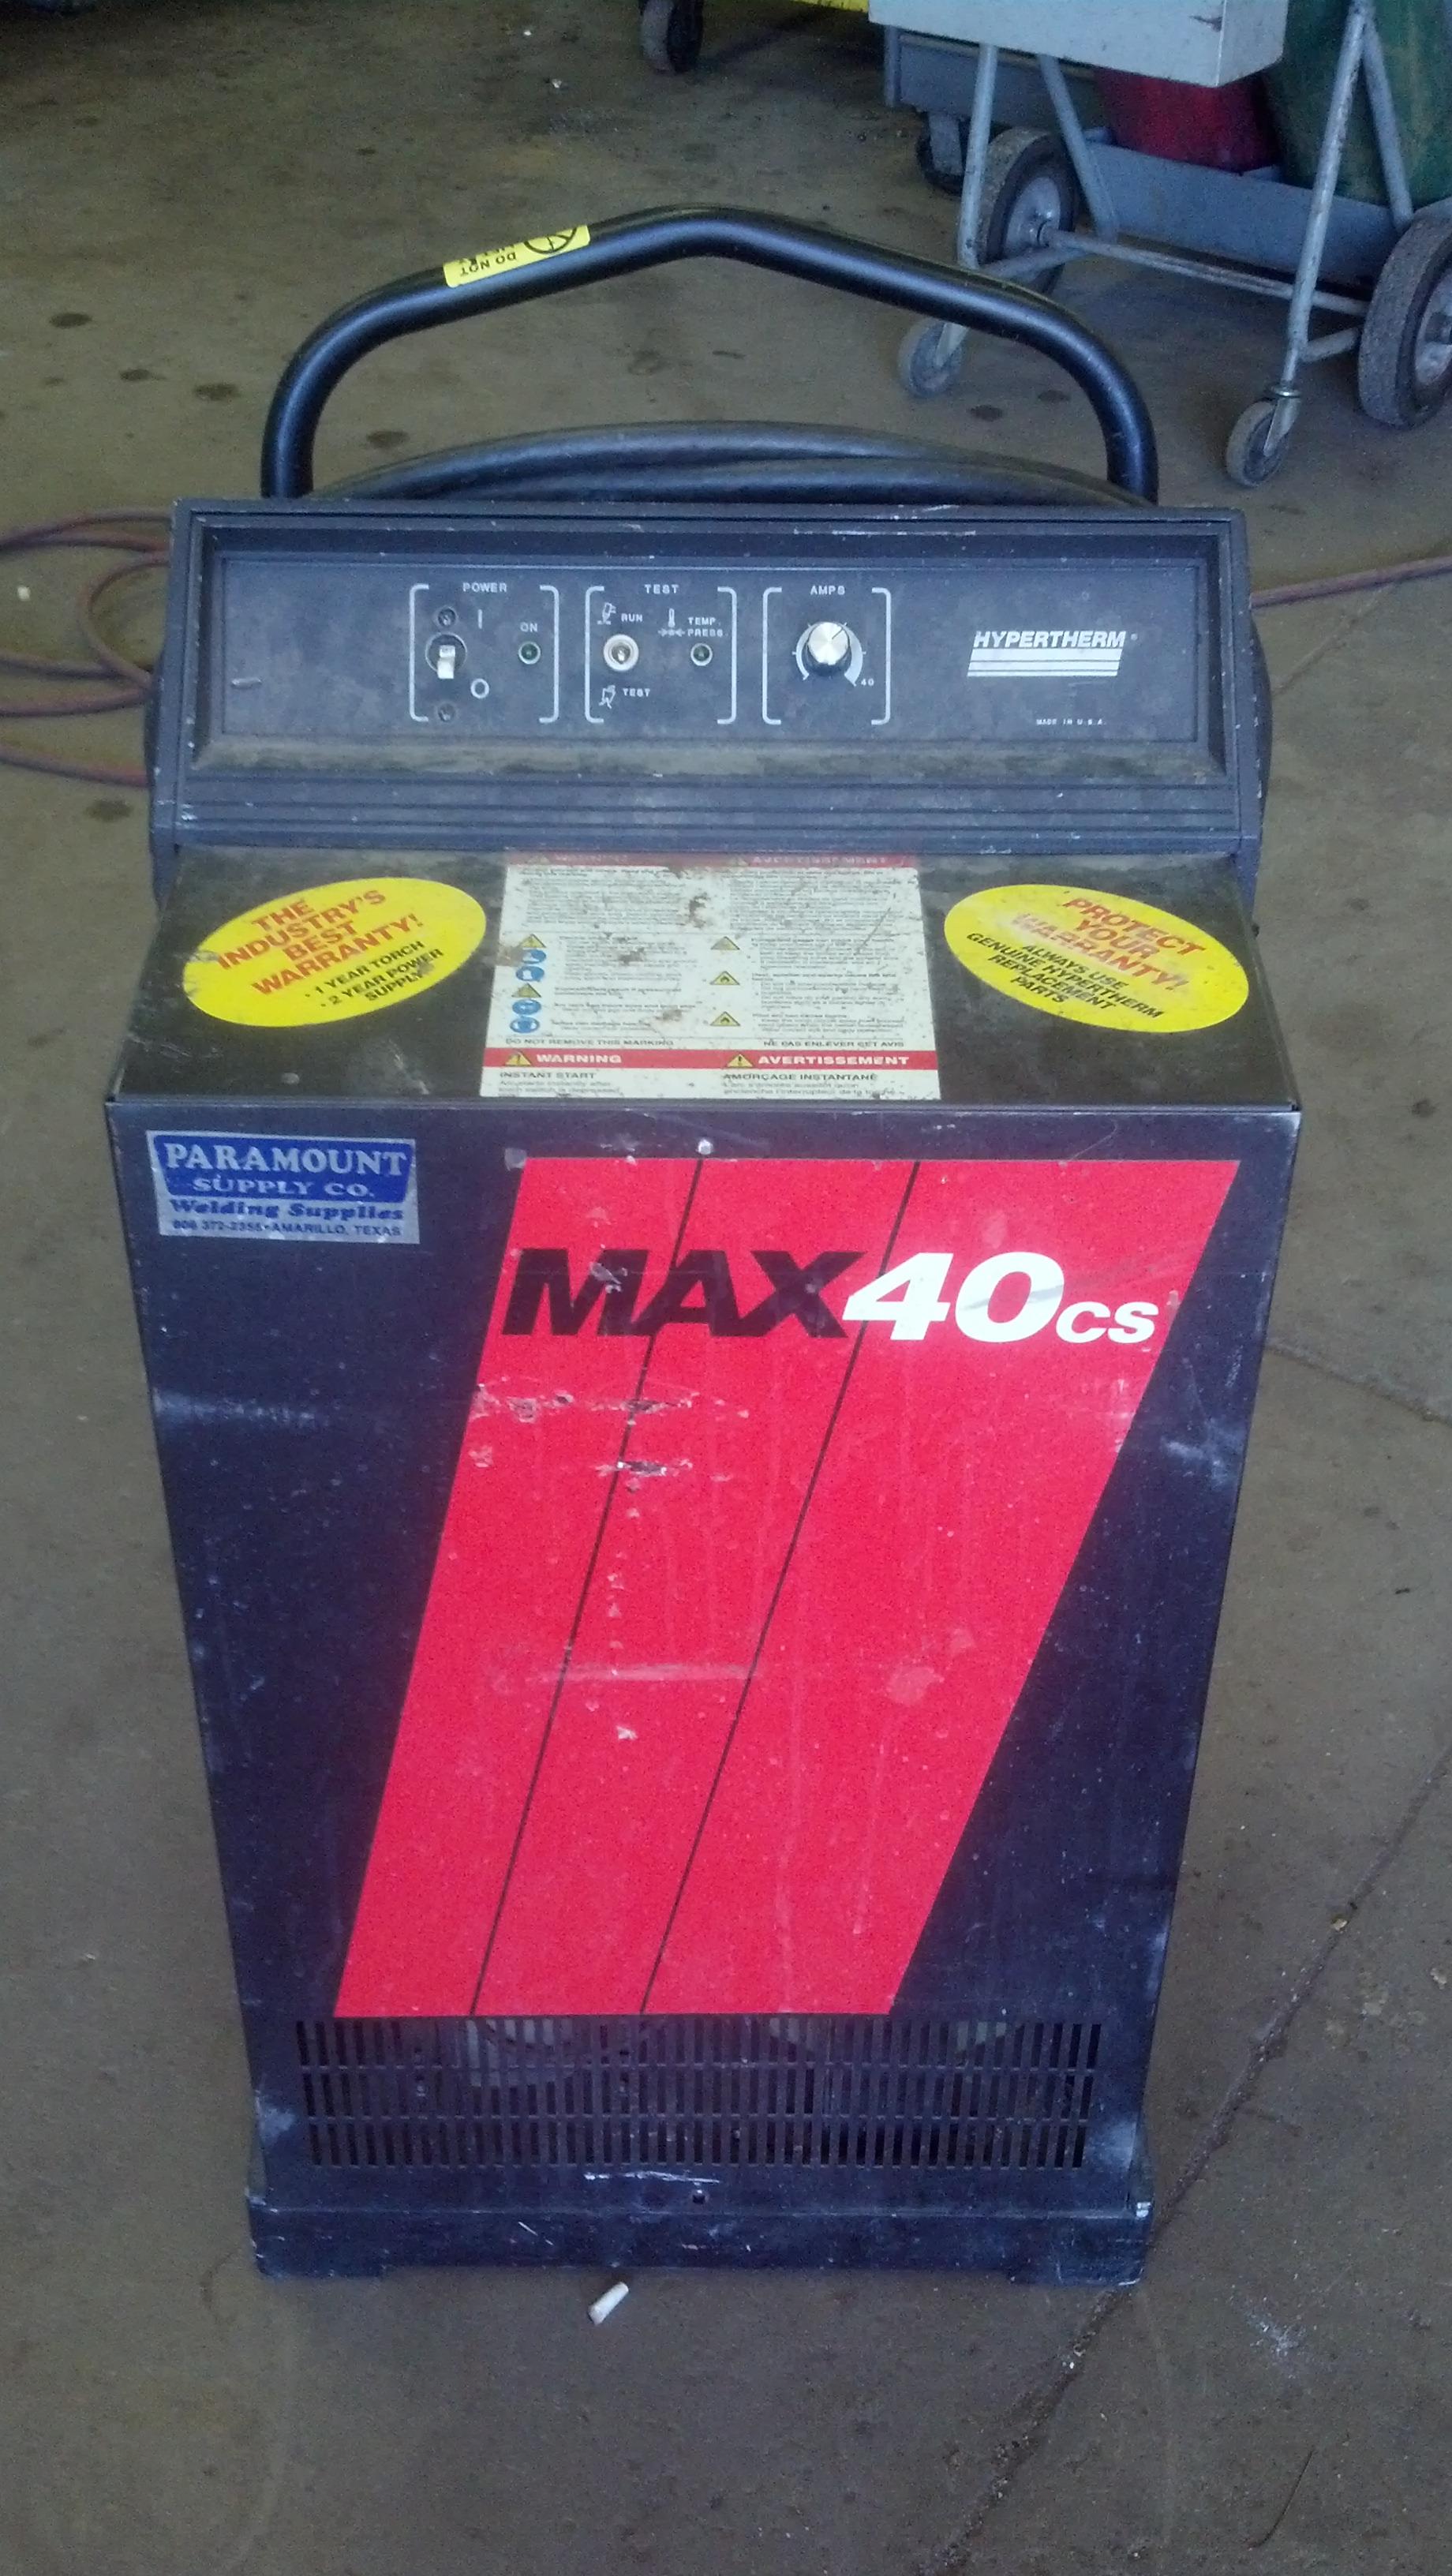 (1) PREOWNED HYPERTHERM PLASMA CUTTING SYSTEM - MODEL MAX40CS